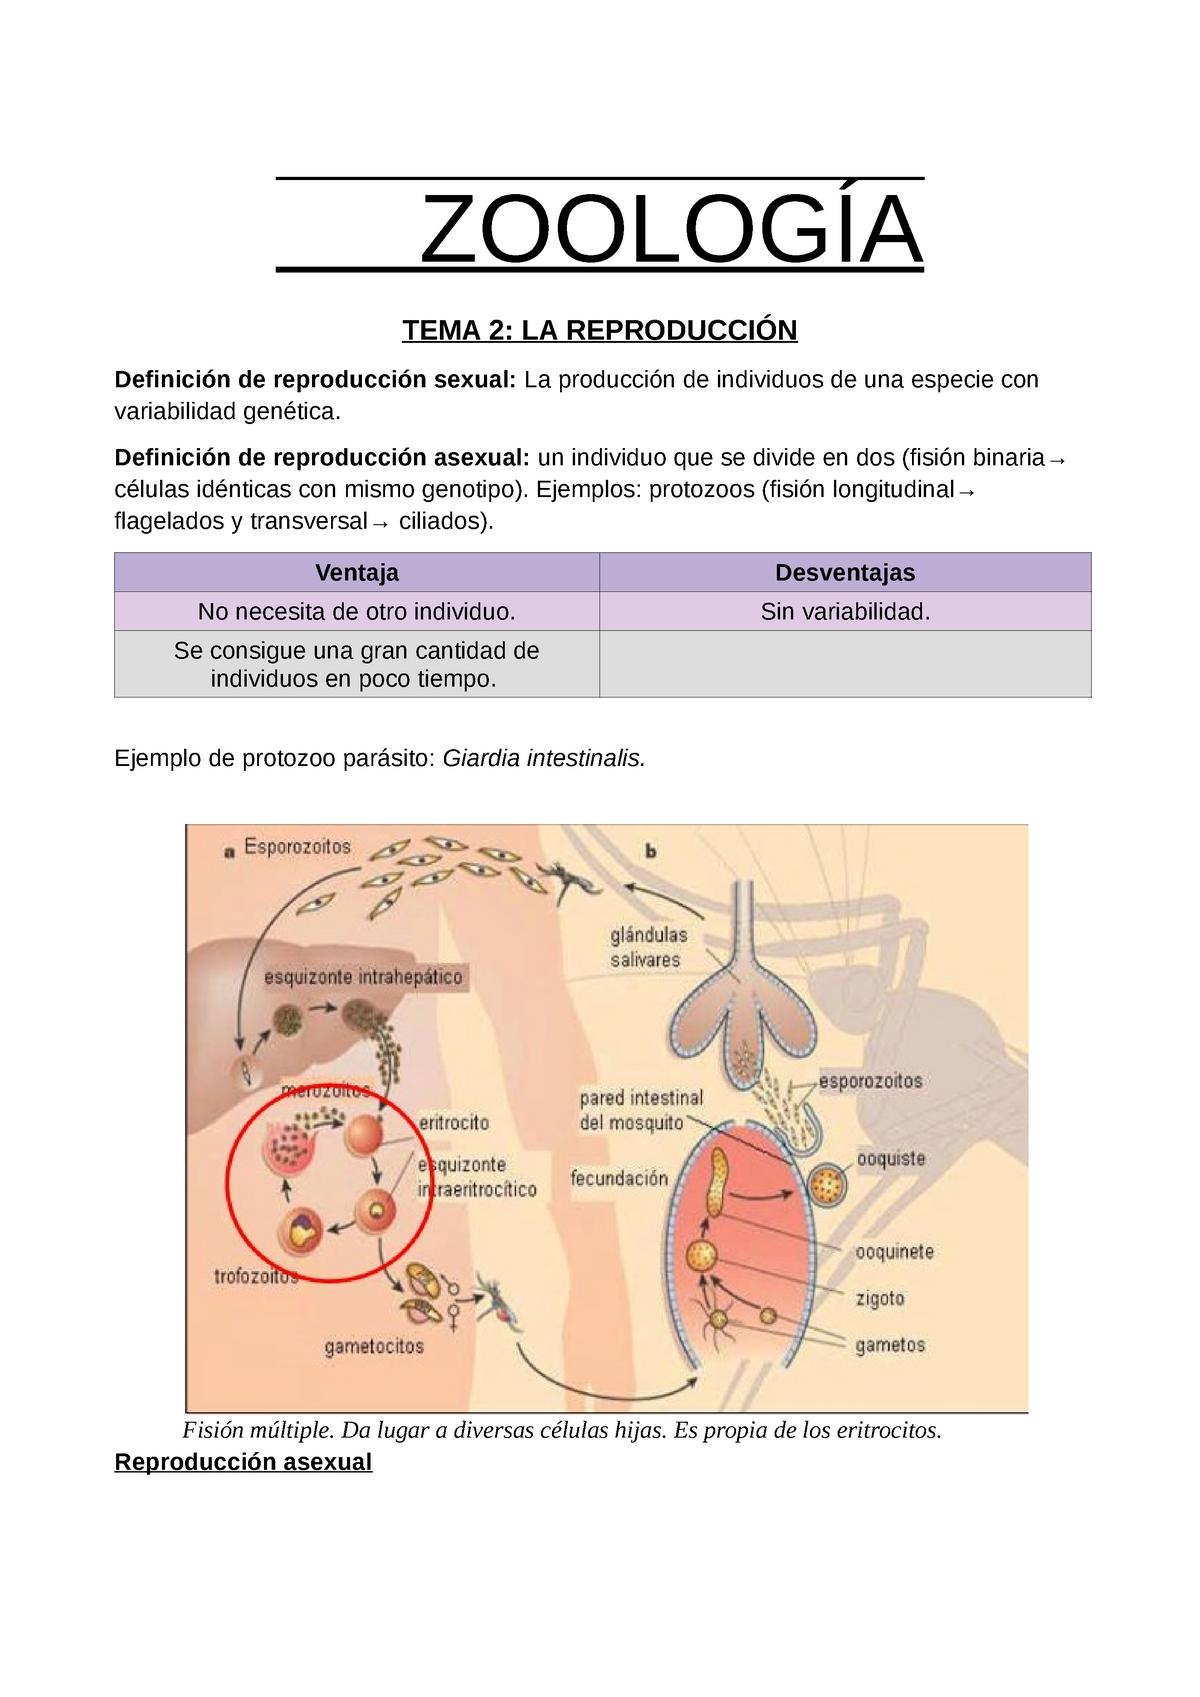 Bél-protozoa « science